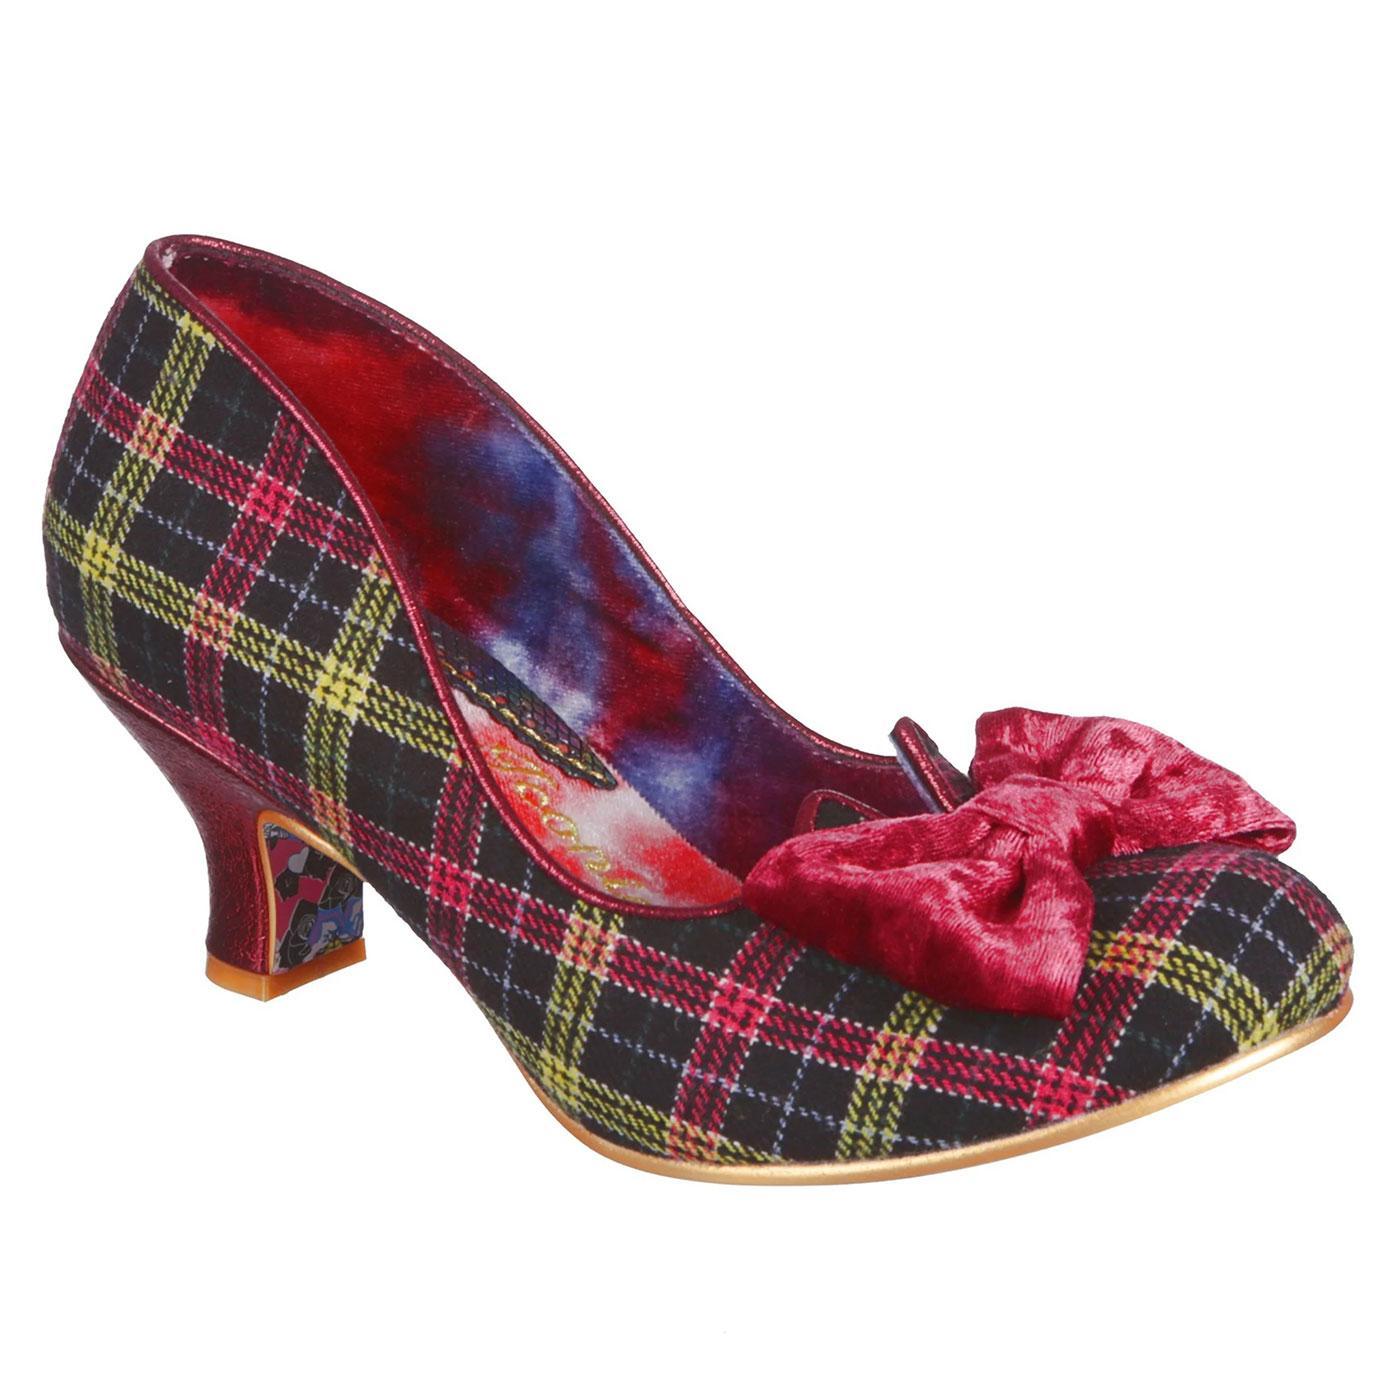 Dazzle Razzle IRREGULAR CHOICE Tartan Check Shoes